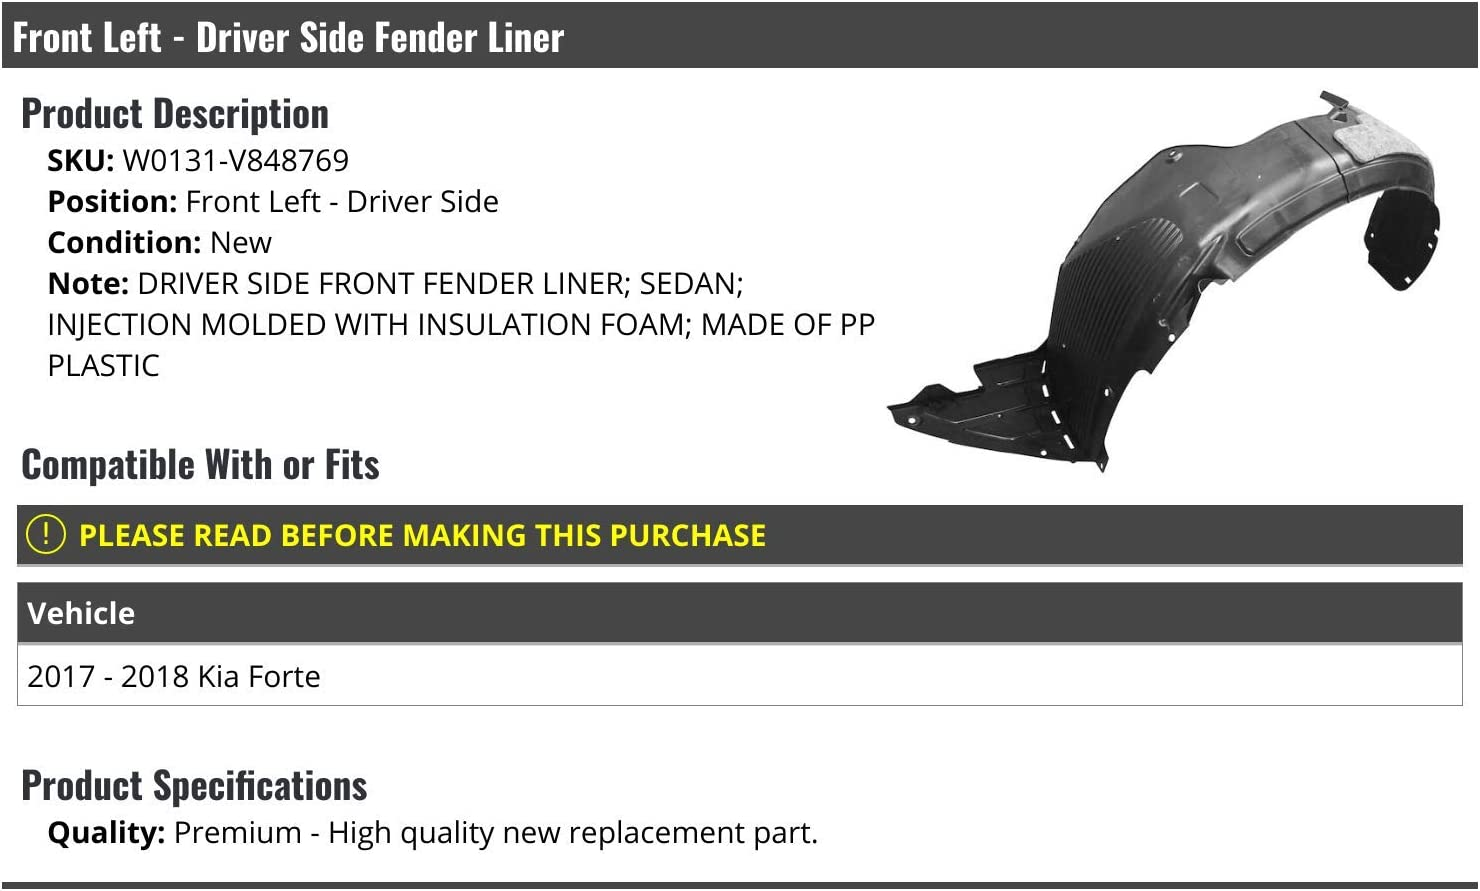 Compatible with 2017-2018 Kia Forte Sedan Front Left Driver Side Inner Fender Liner